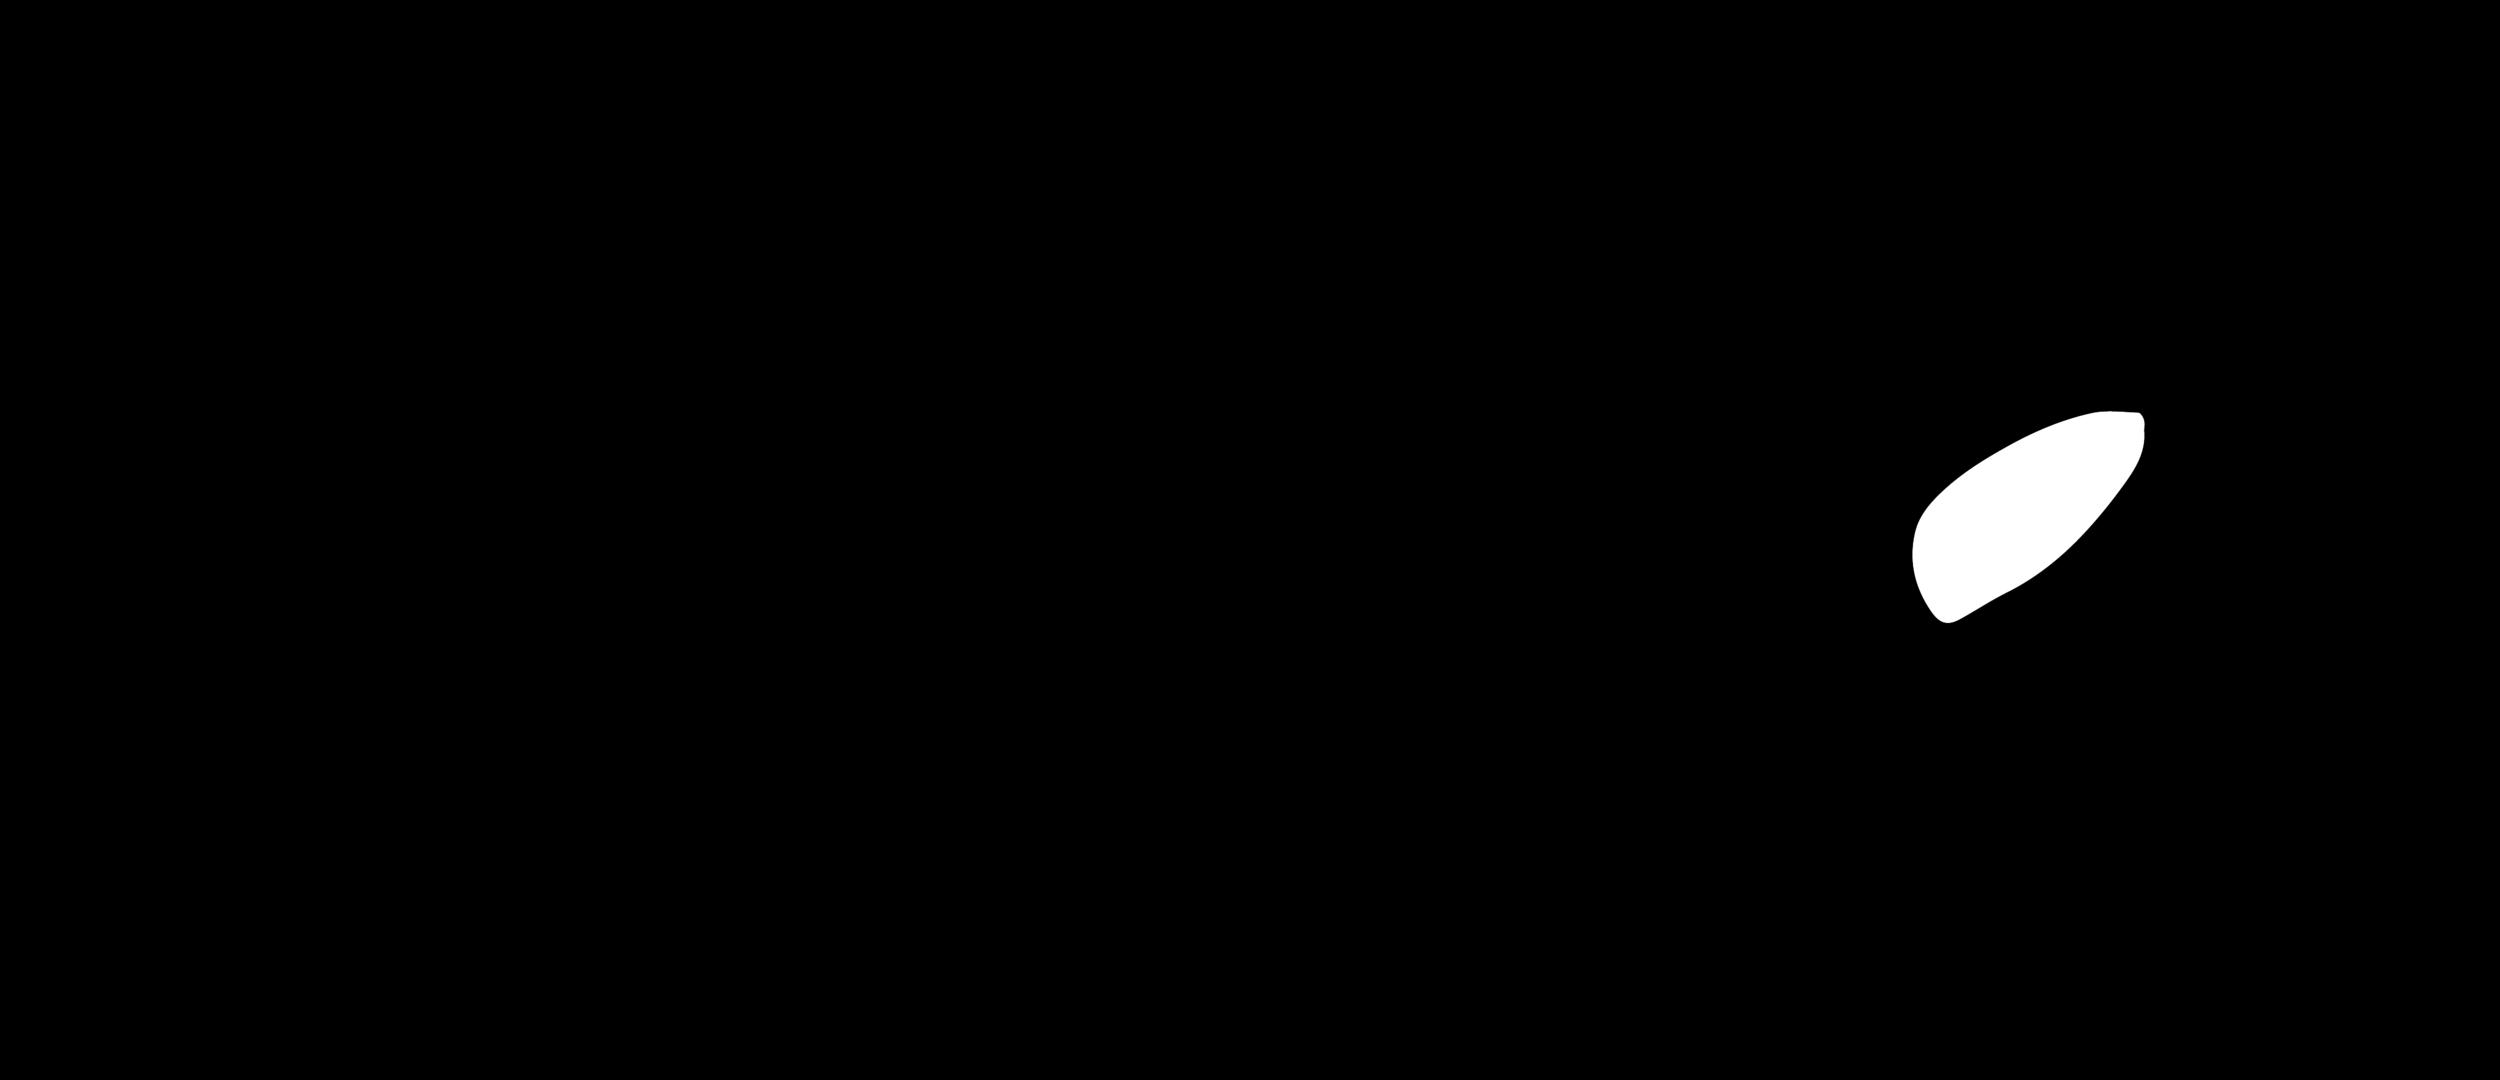 taka-signature-transparent.png